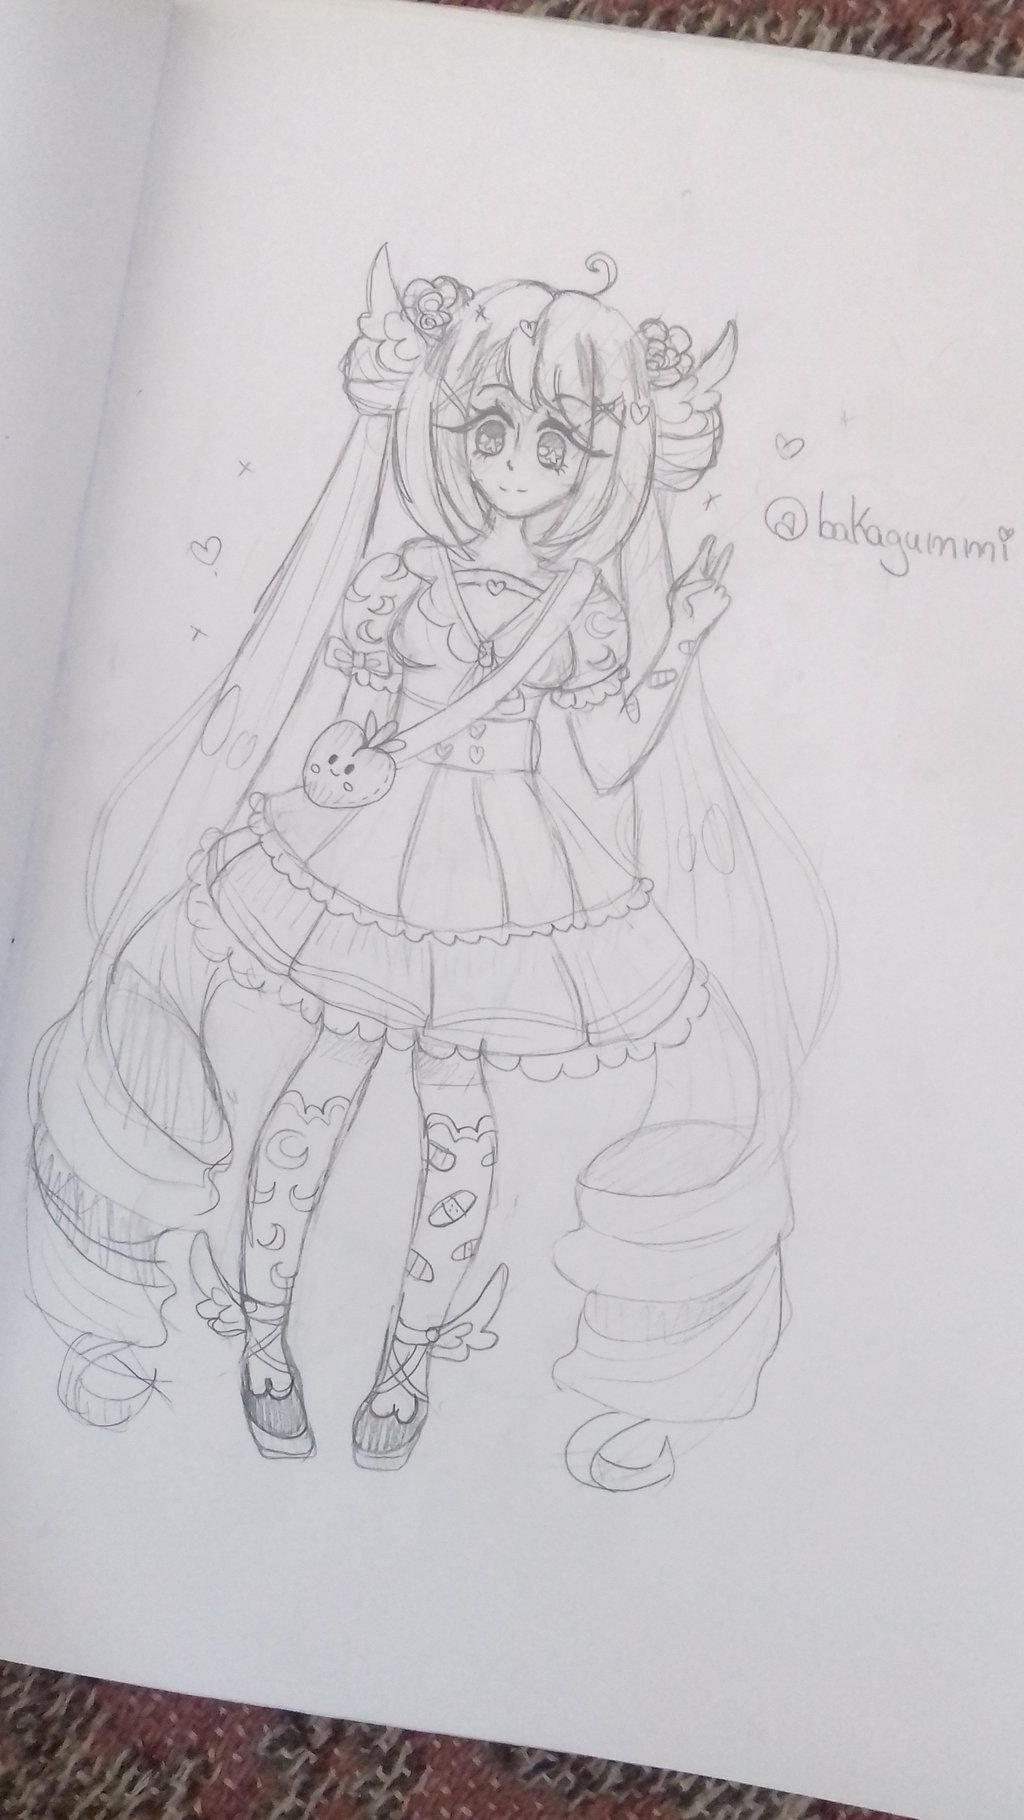 Anime oc wip  by bakagummi